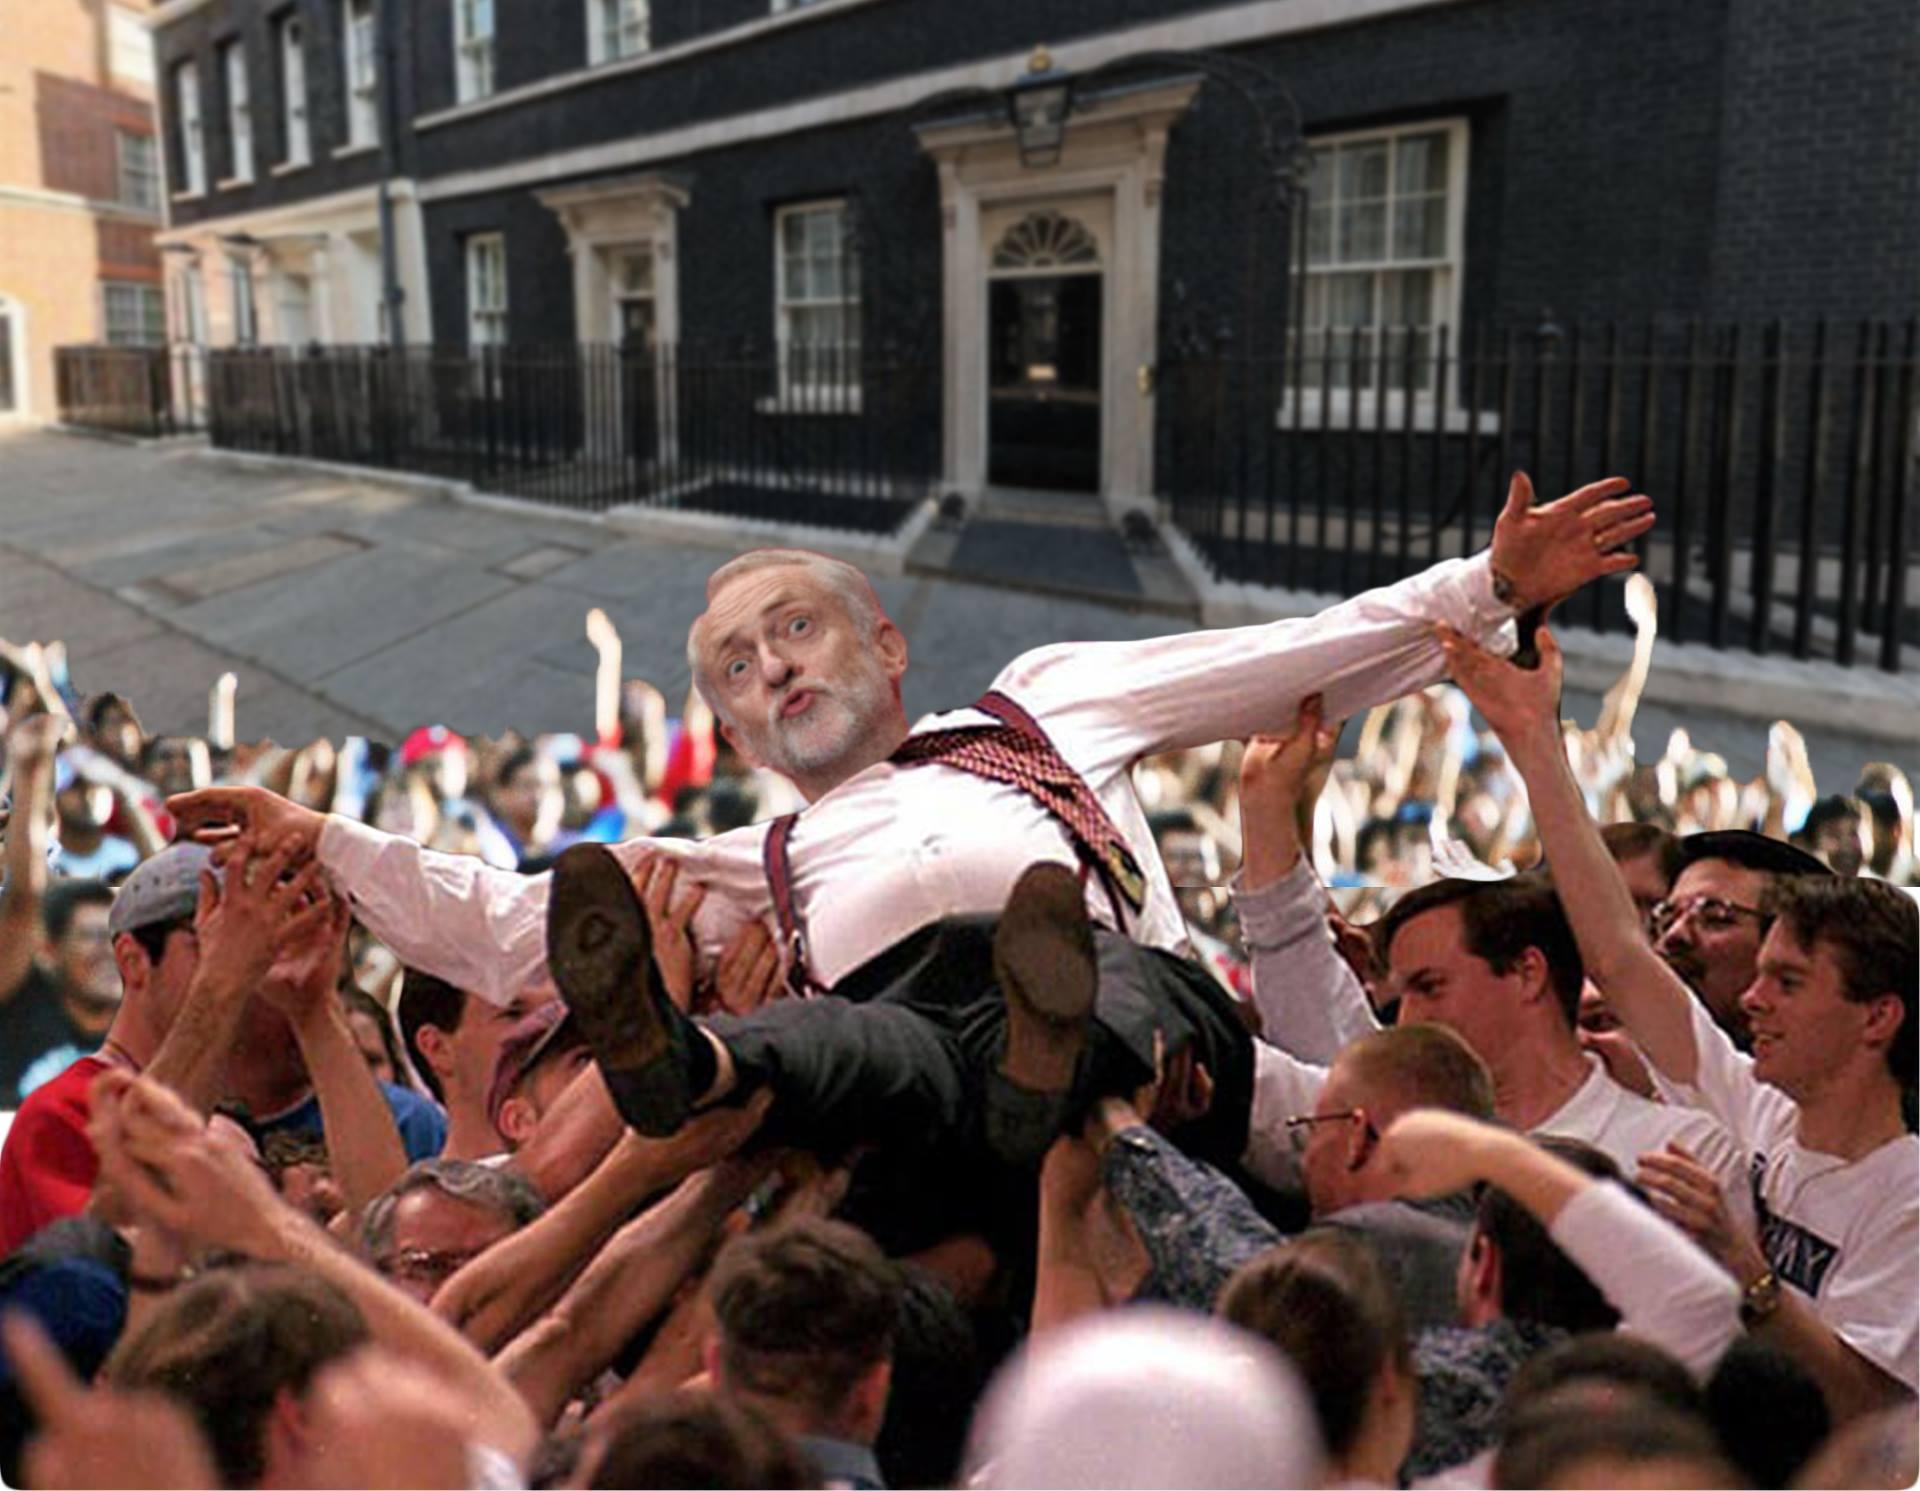 Youthquake hits Britain